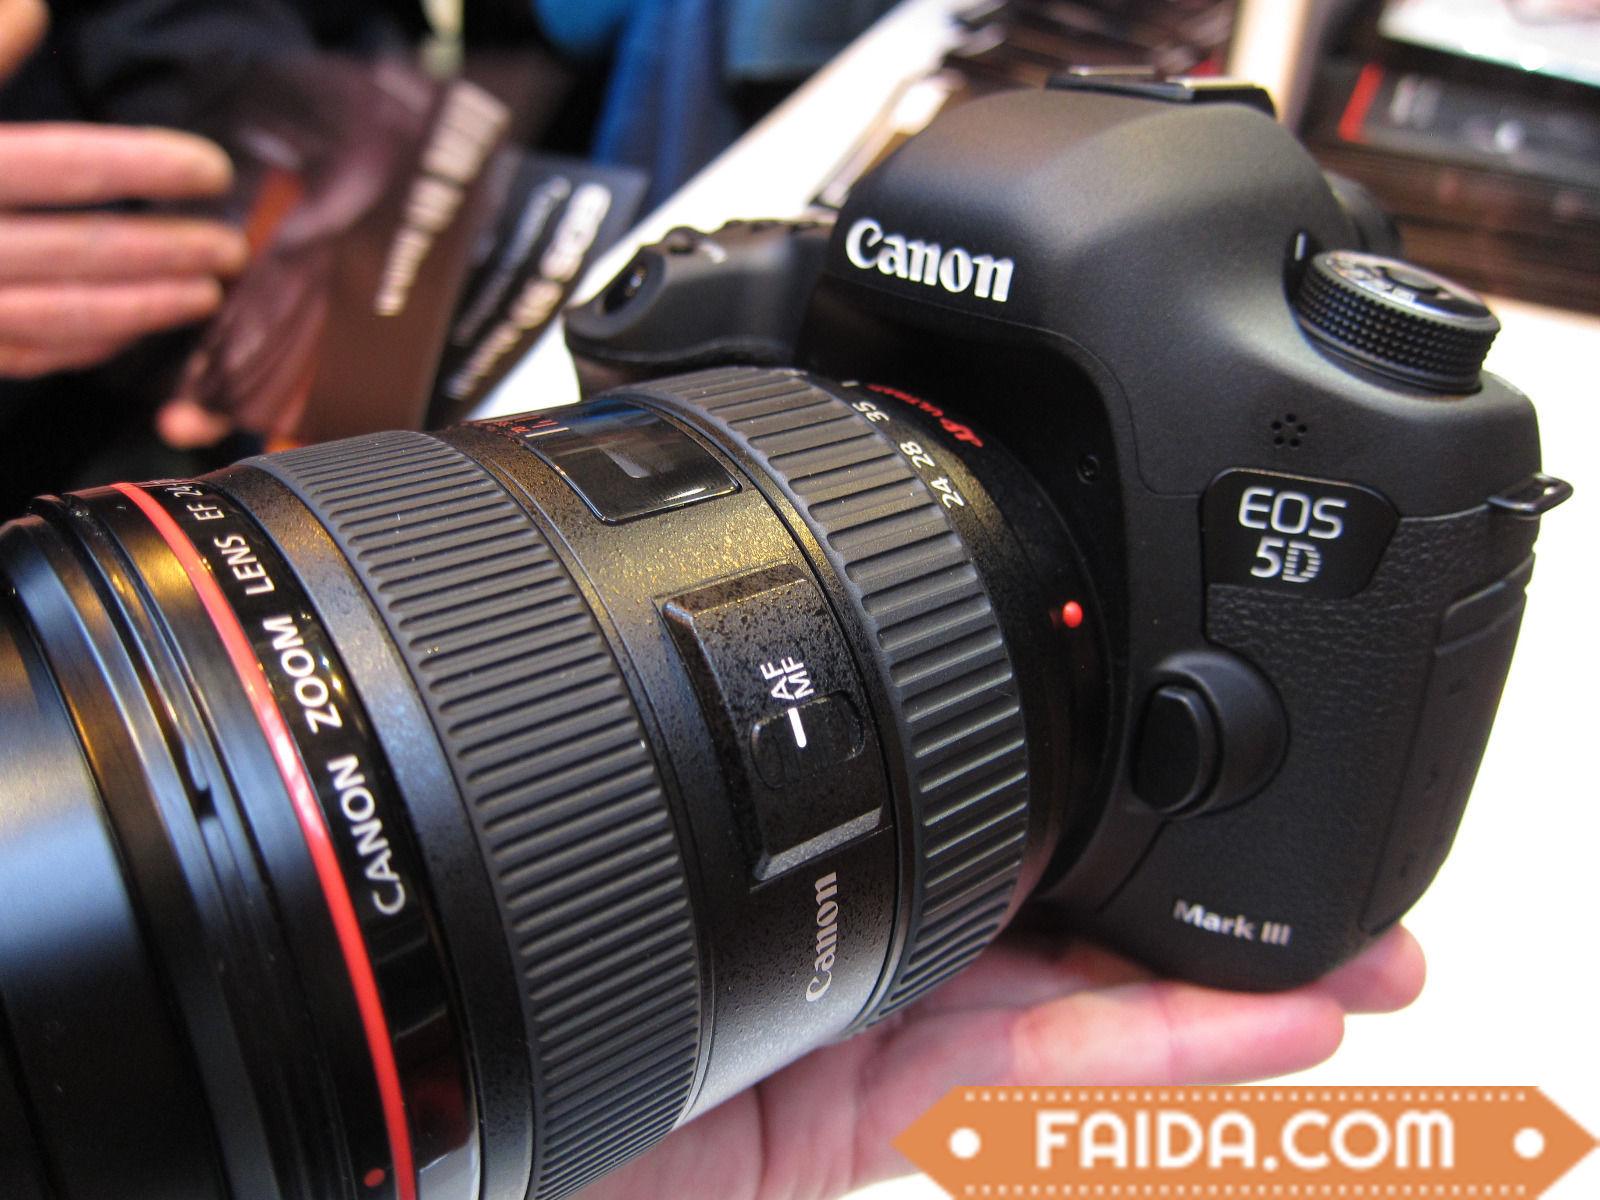 Canon 5D mark III / mark II / 5D mark IV Digital Camera